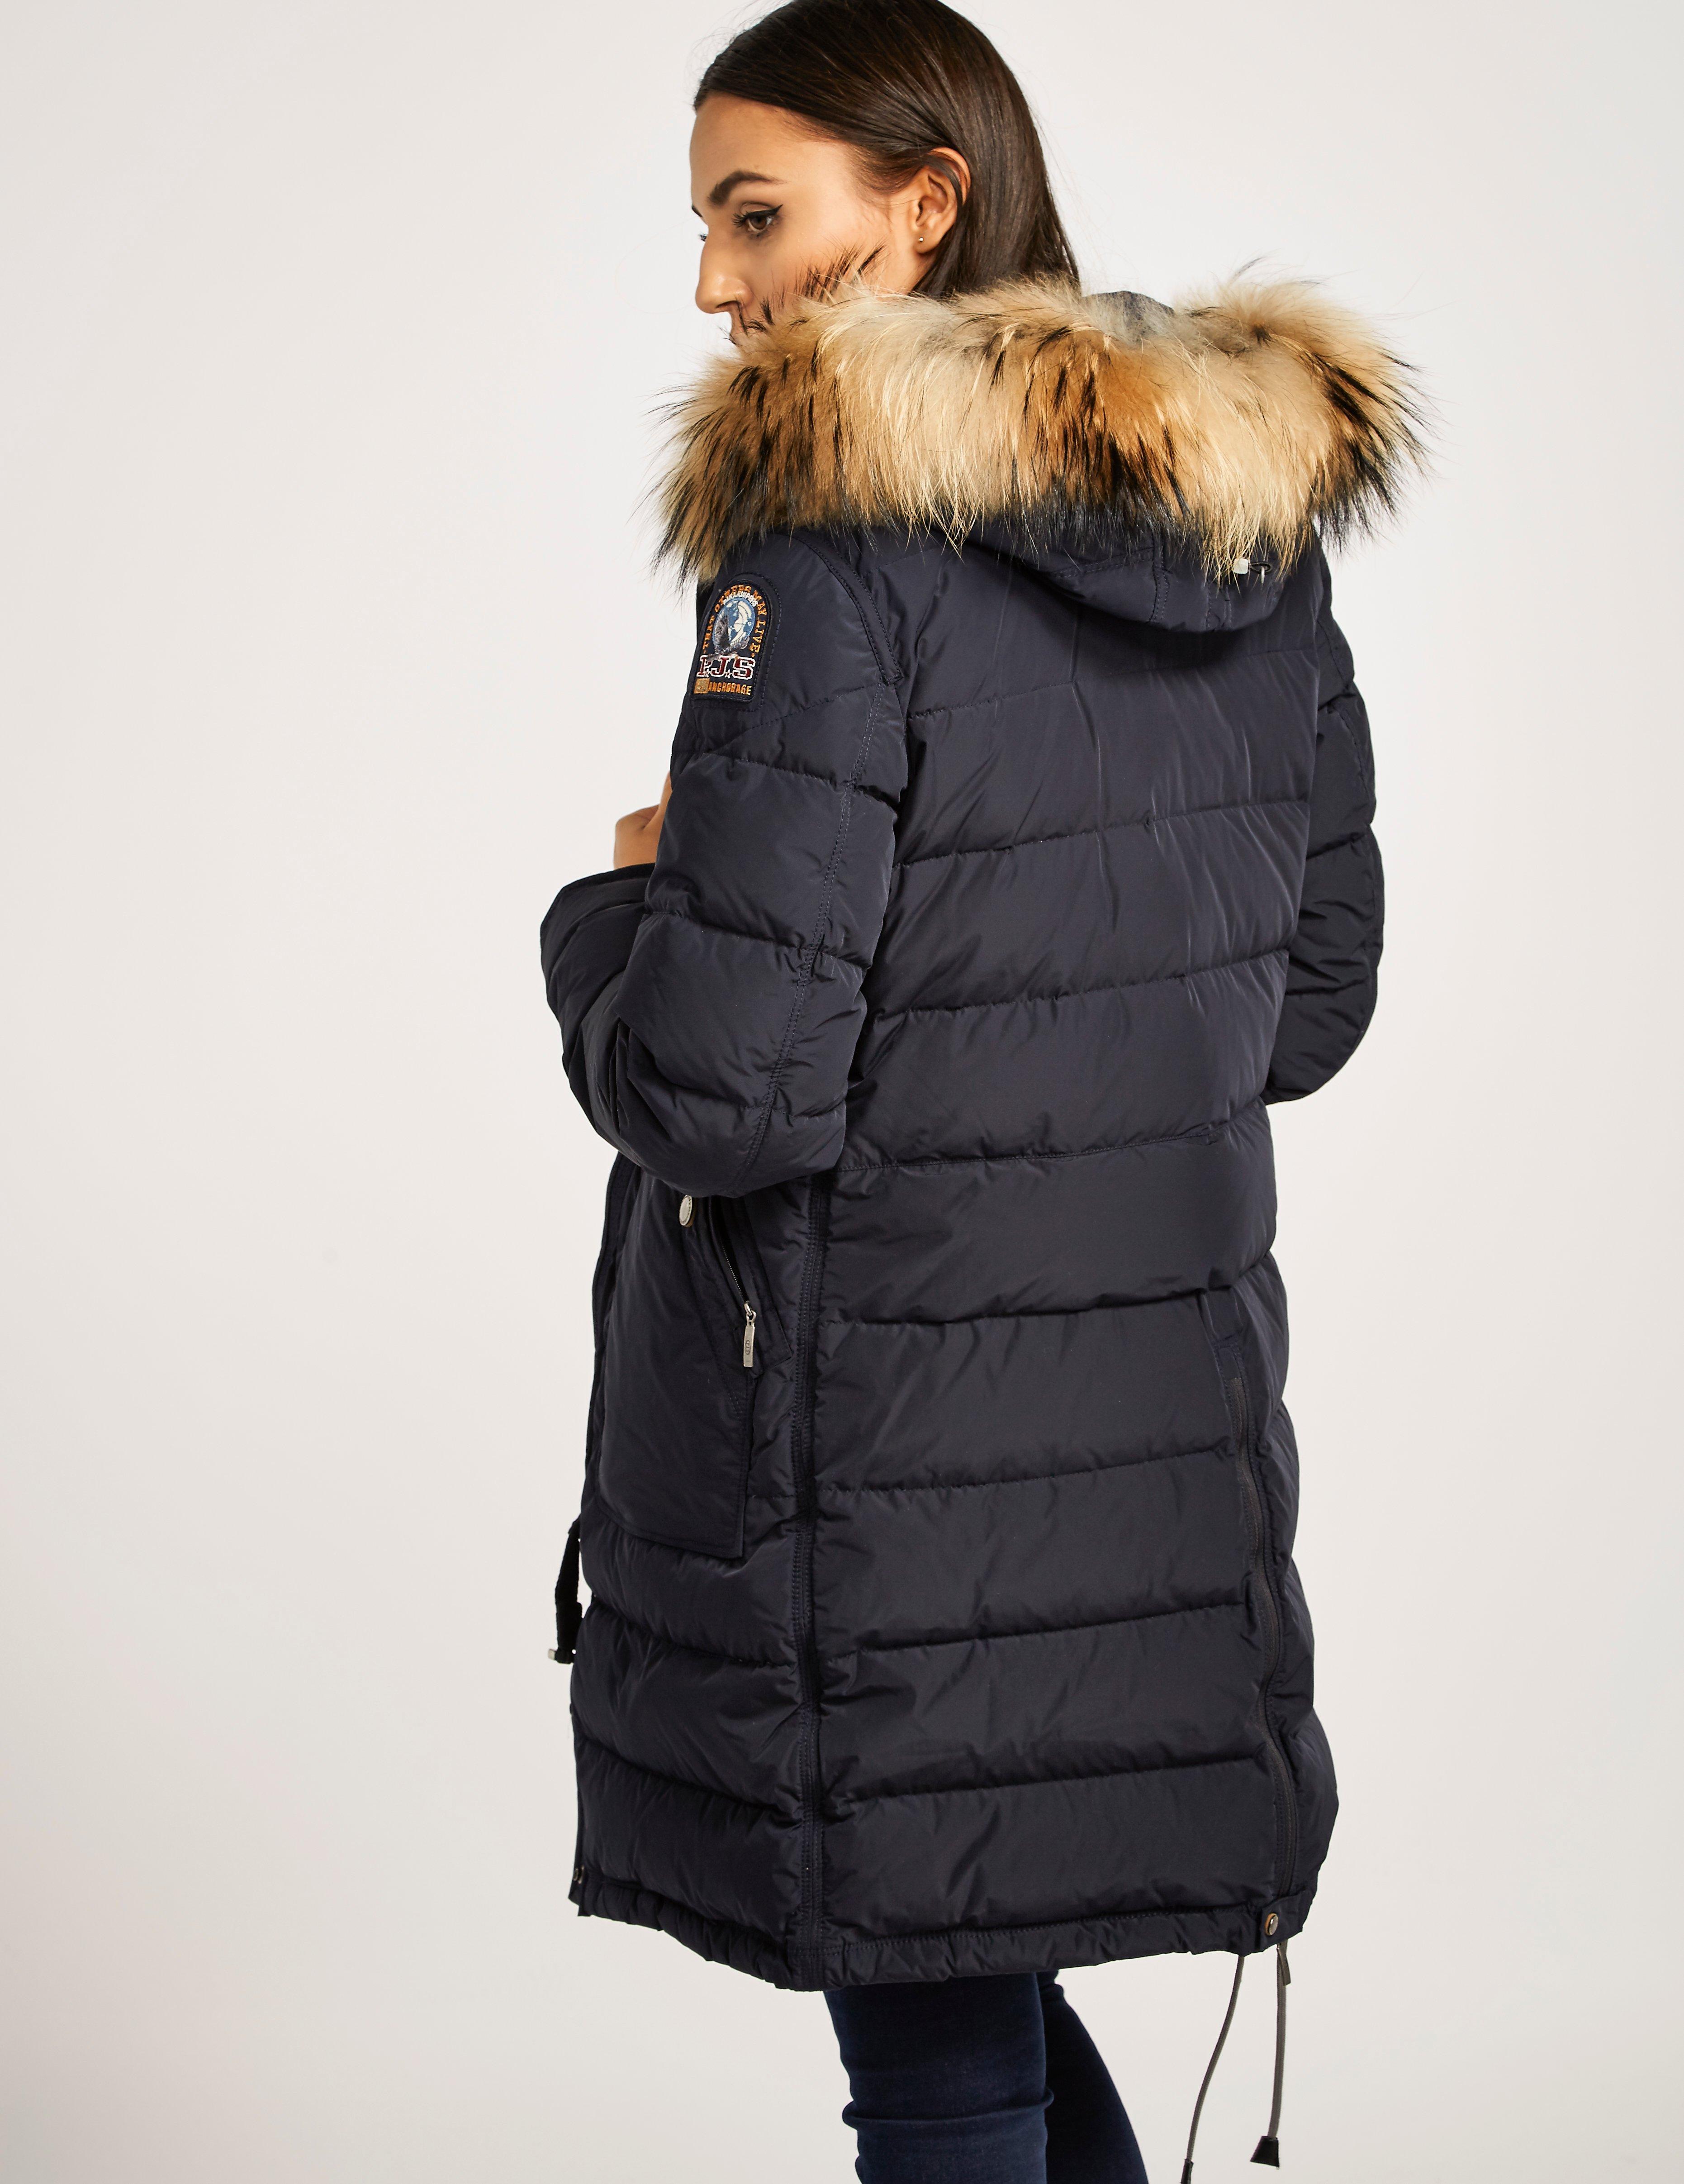 6dc84168 ... best price parajumpers light long bear jakke red kvinner  norgeparajumpers kodiak blackpromotion . 25e8e 76f3c